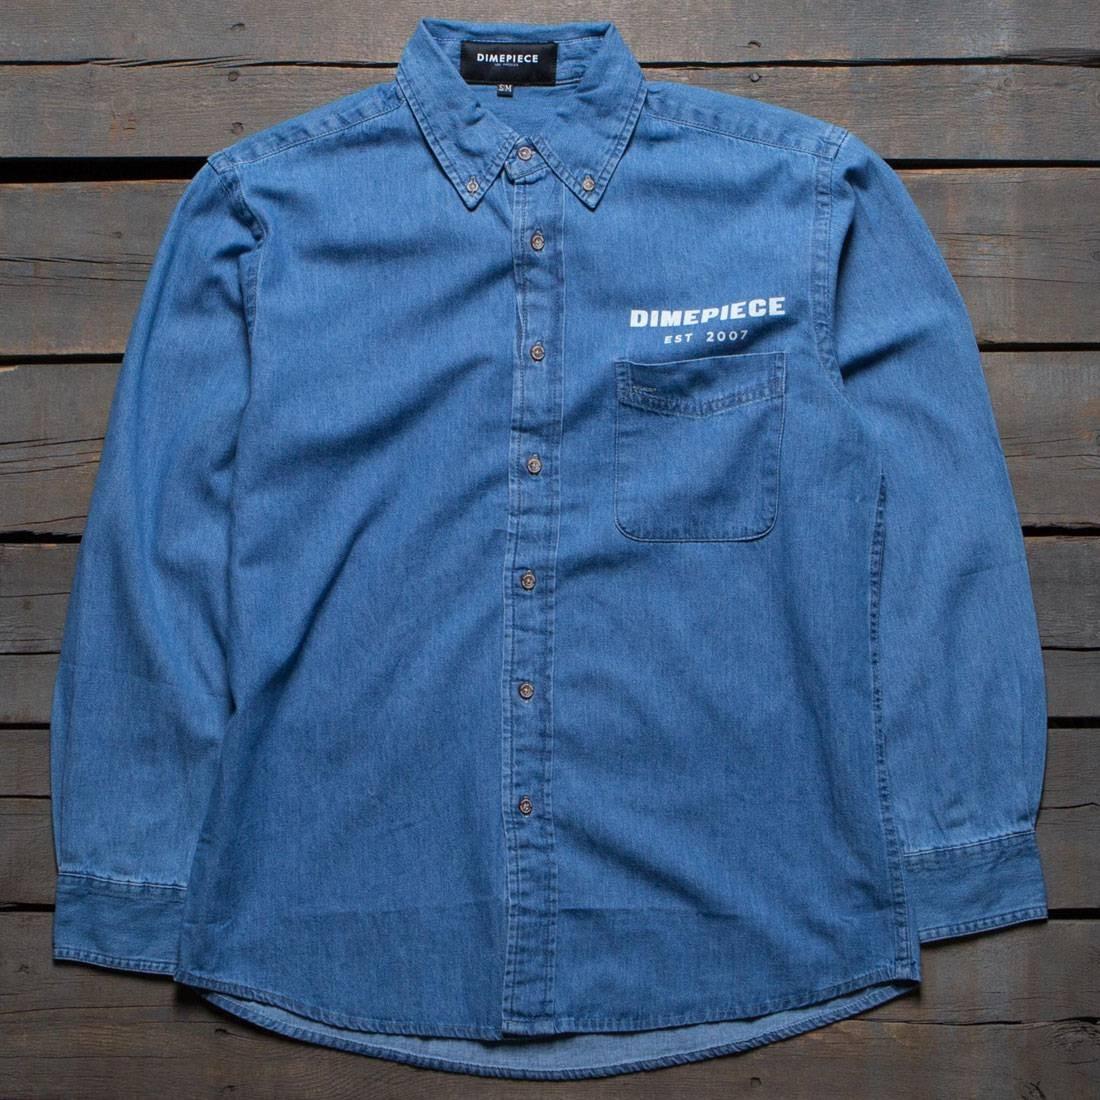 30c482962a Dimepiece Women Supply Denim Button Up Shirt (blue   denim)